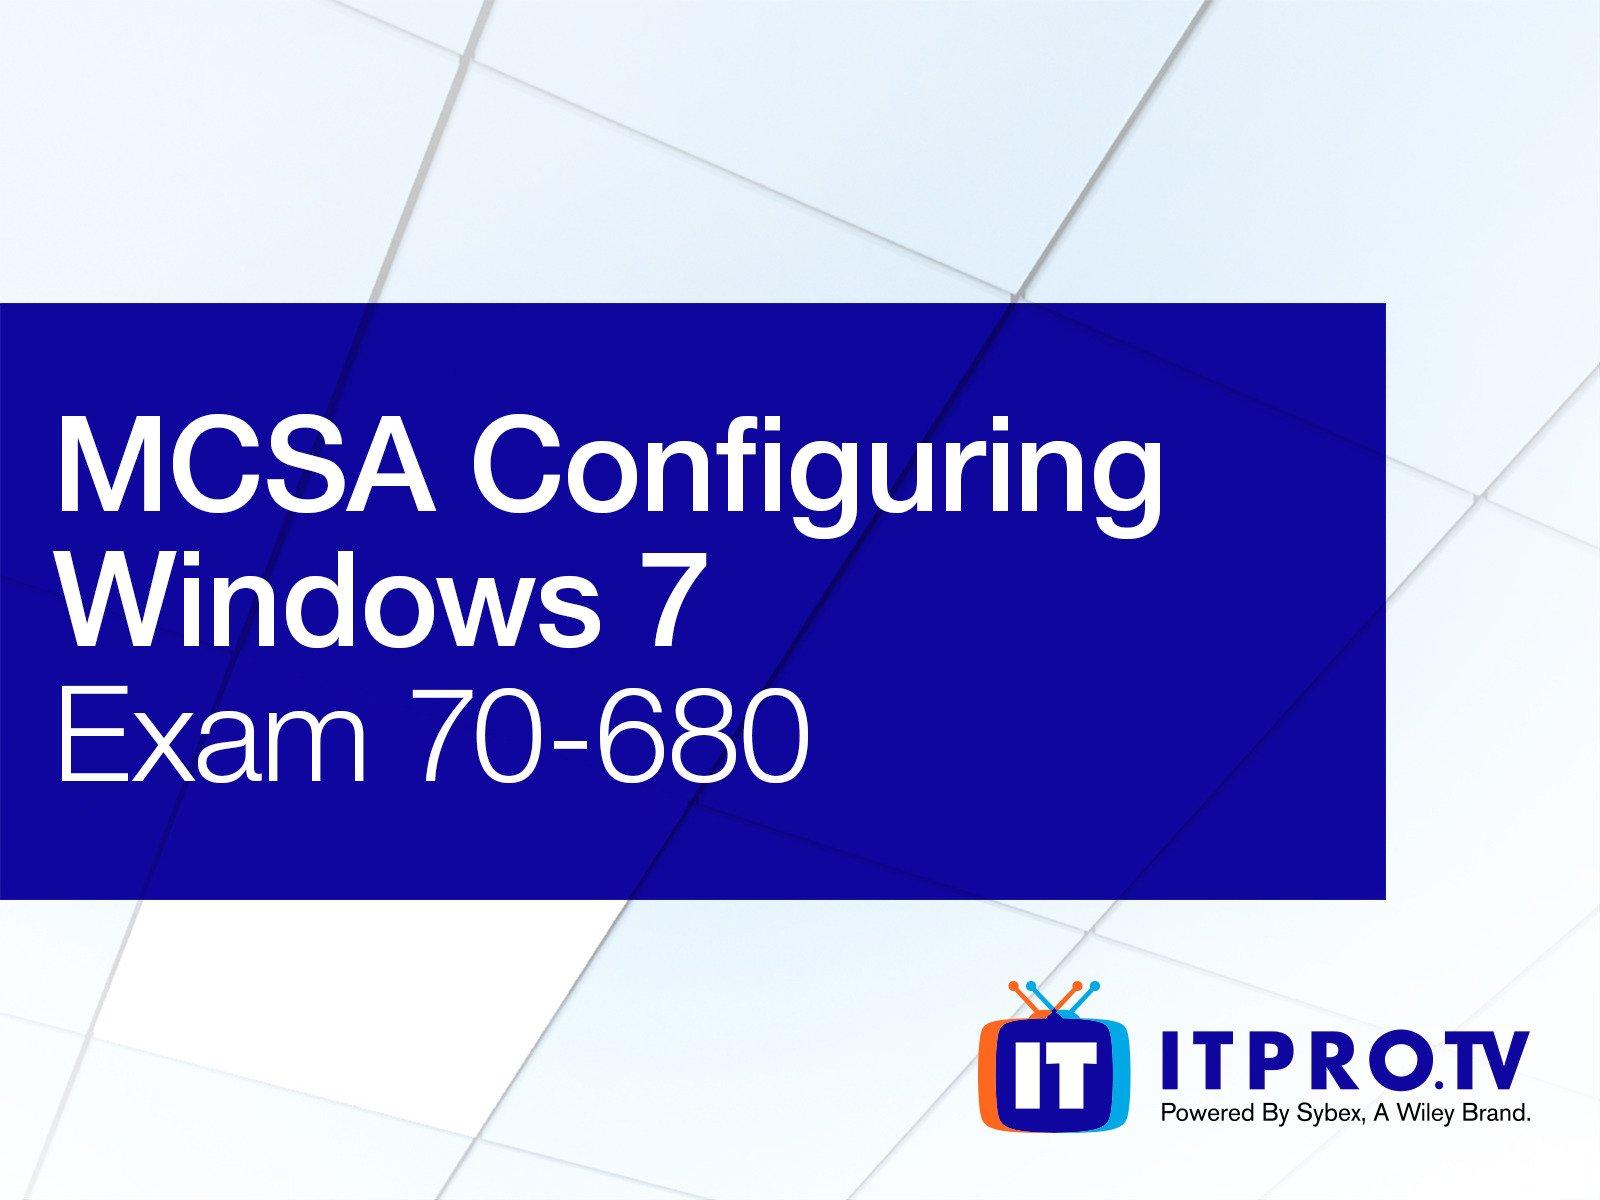 Amazon.com: MCSA Windows 7 - Windows 7, Configuring (Exam 70-680): Don  Pezet, Ronnie Wong, Nate Copeland, ITProTV